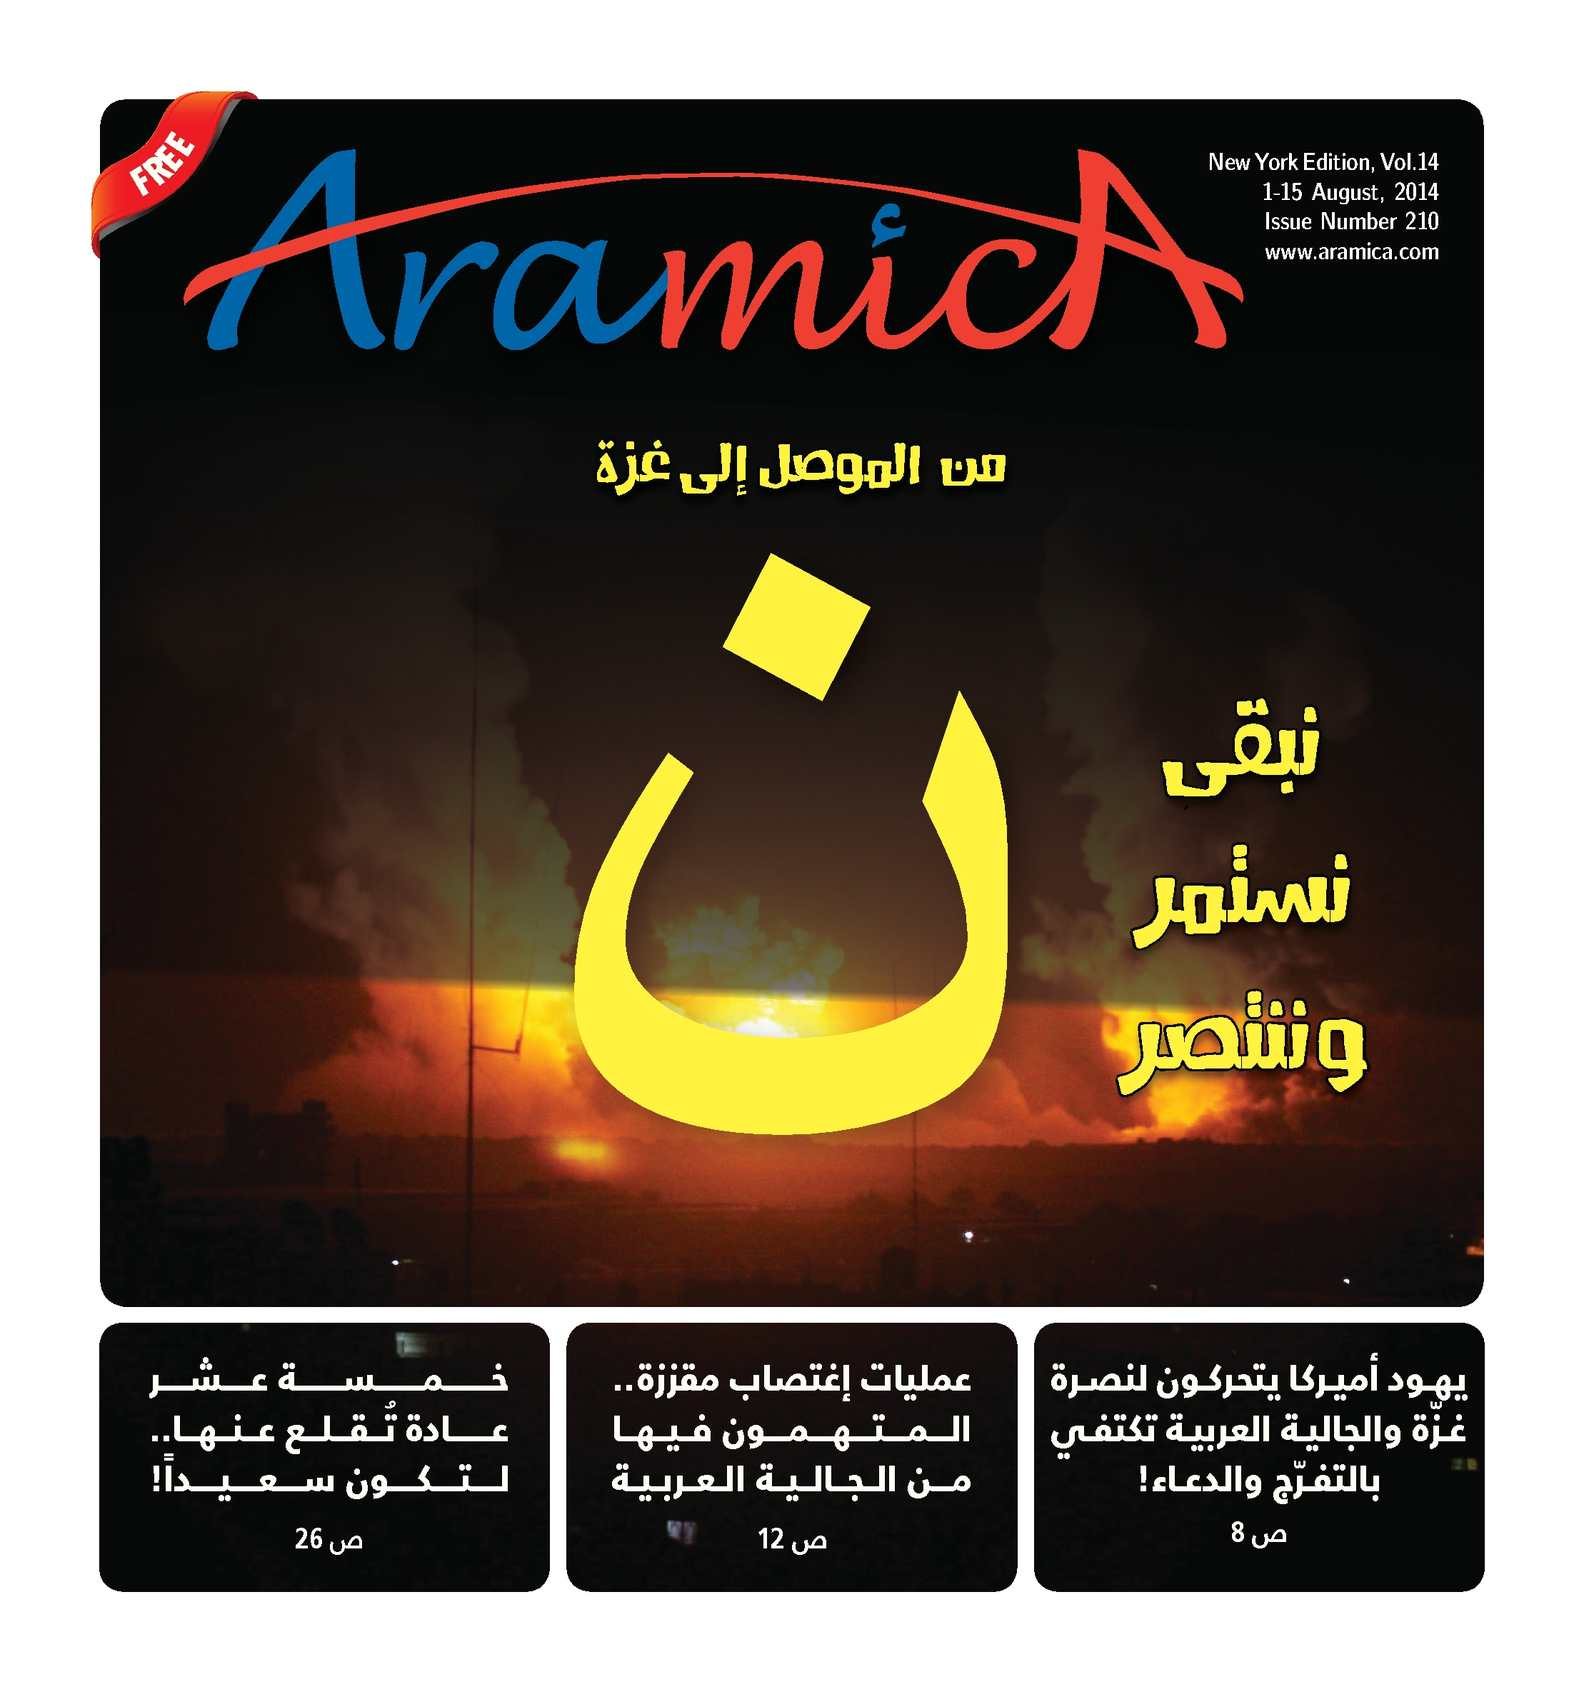 a2f9ee42c Calaméo - ARAMICA ISSUE # 210